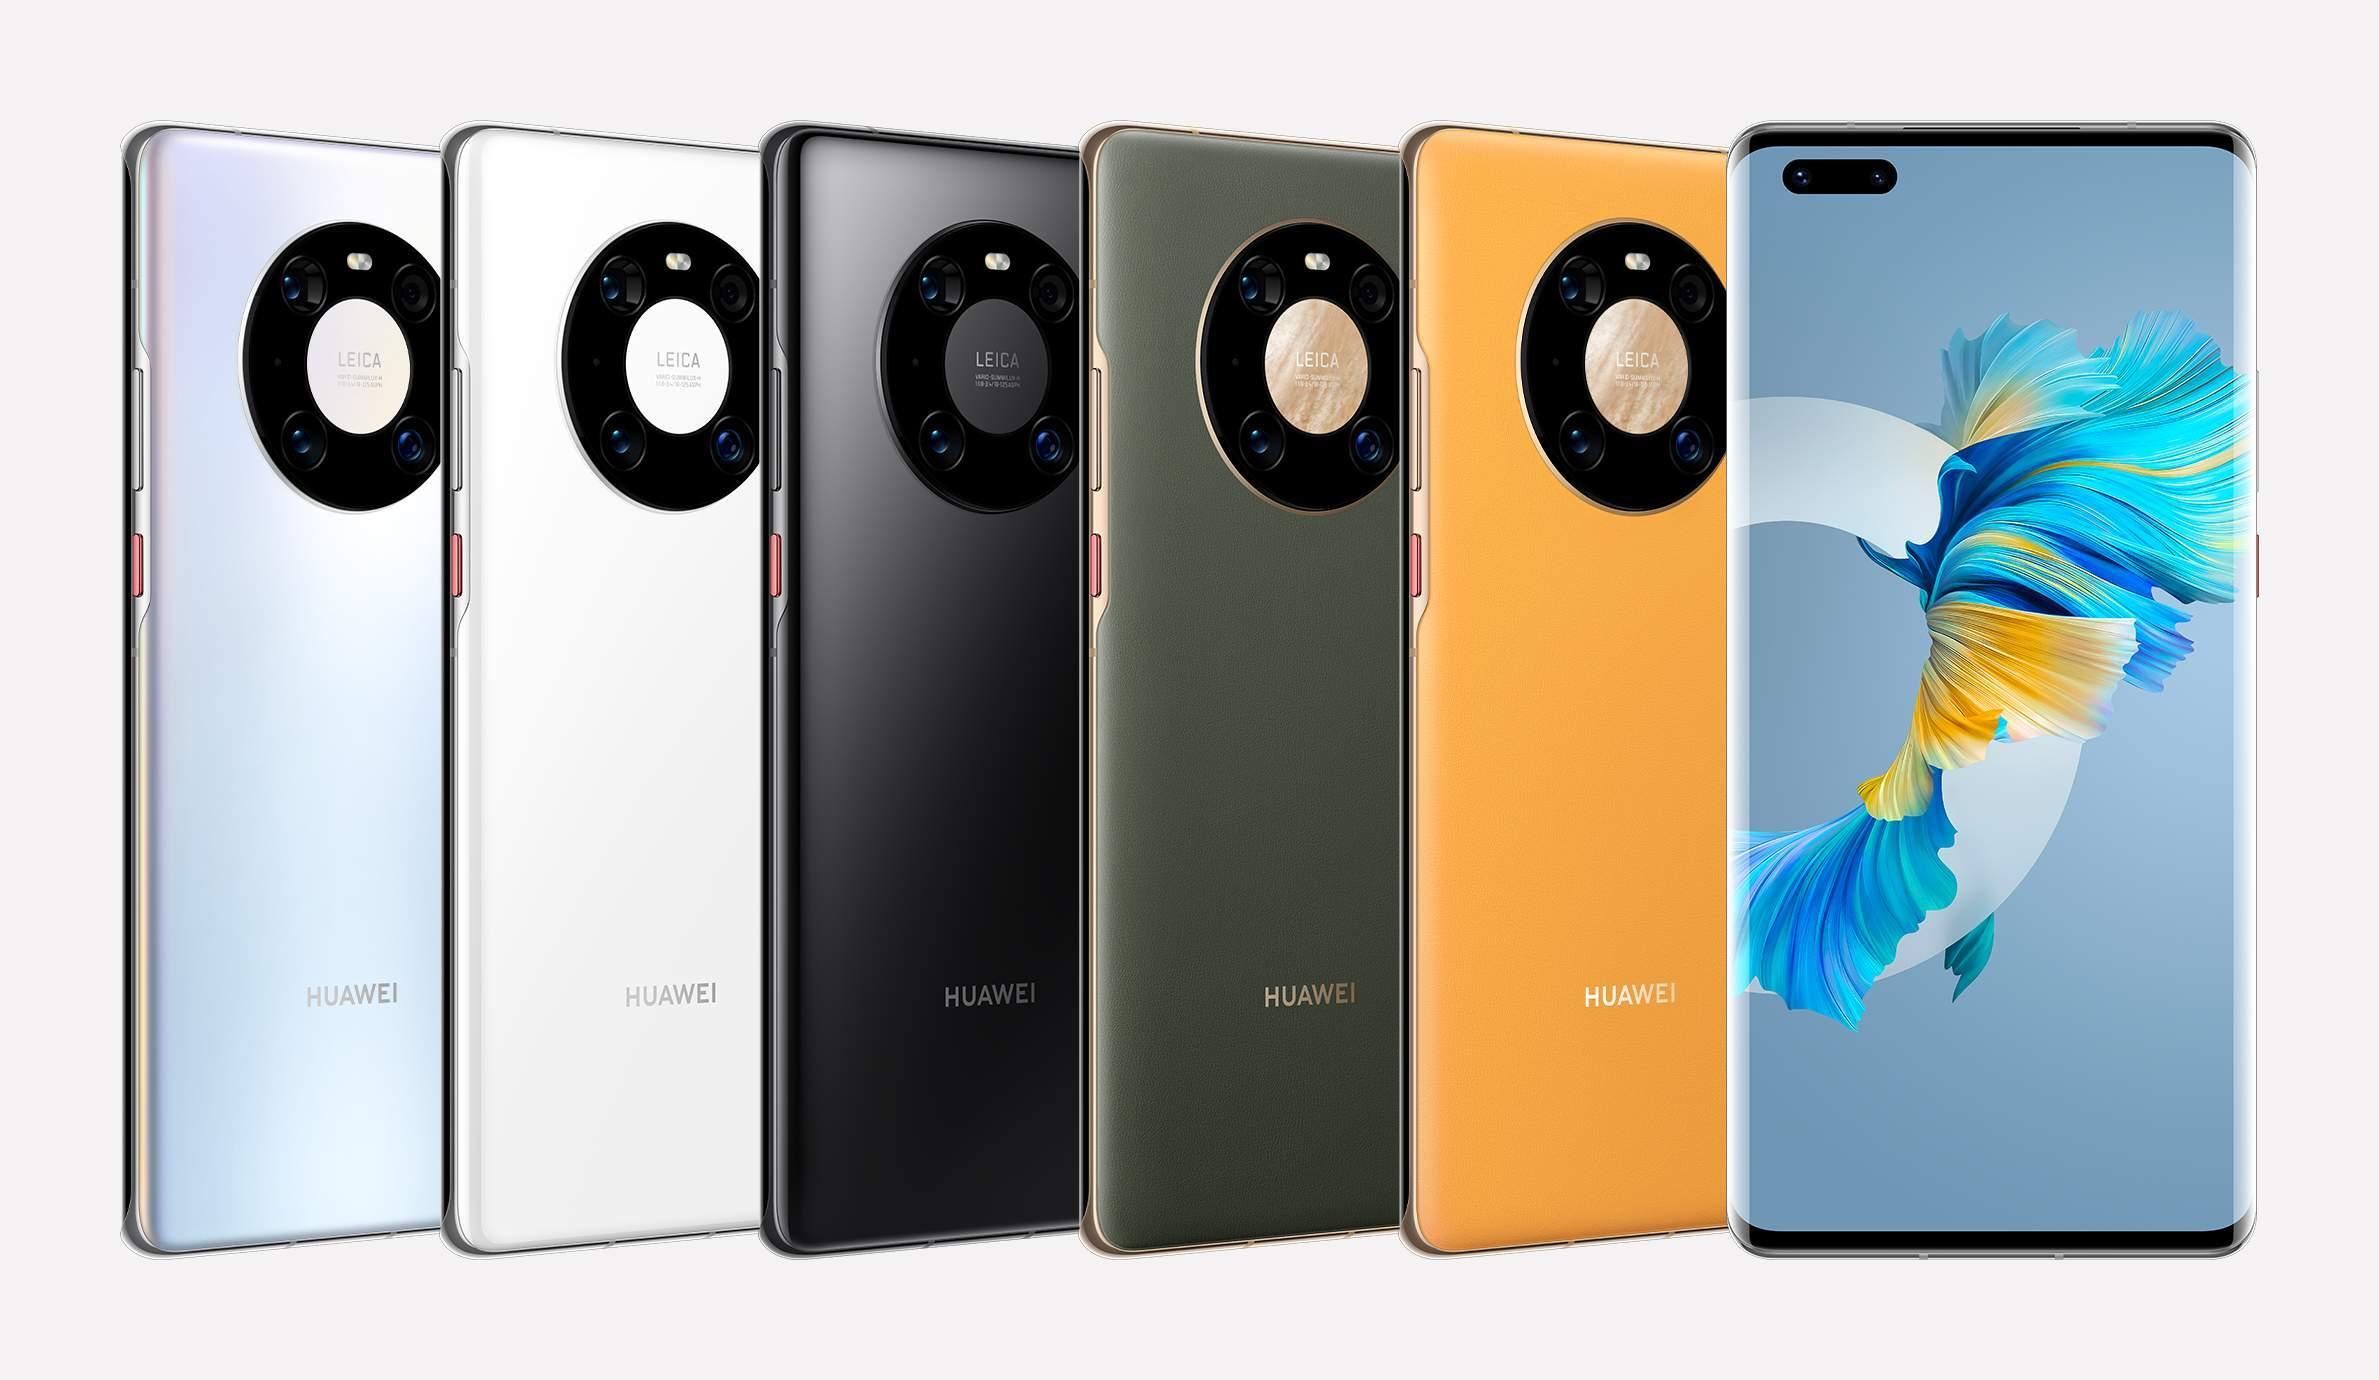 سعر ومواصفات هاتف HUAWEI Mate 40 Pro في السعودية 2